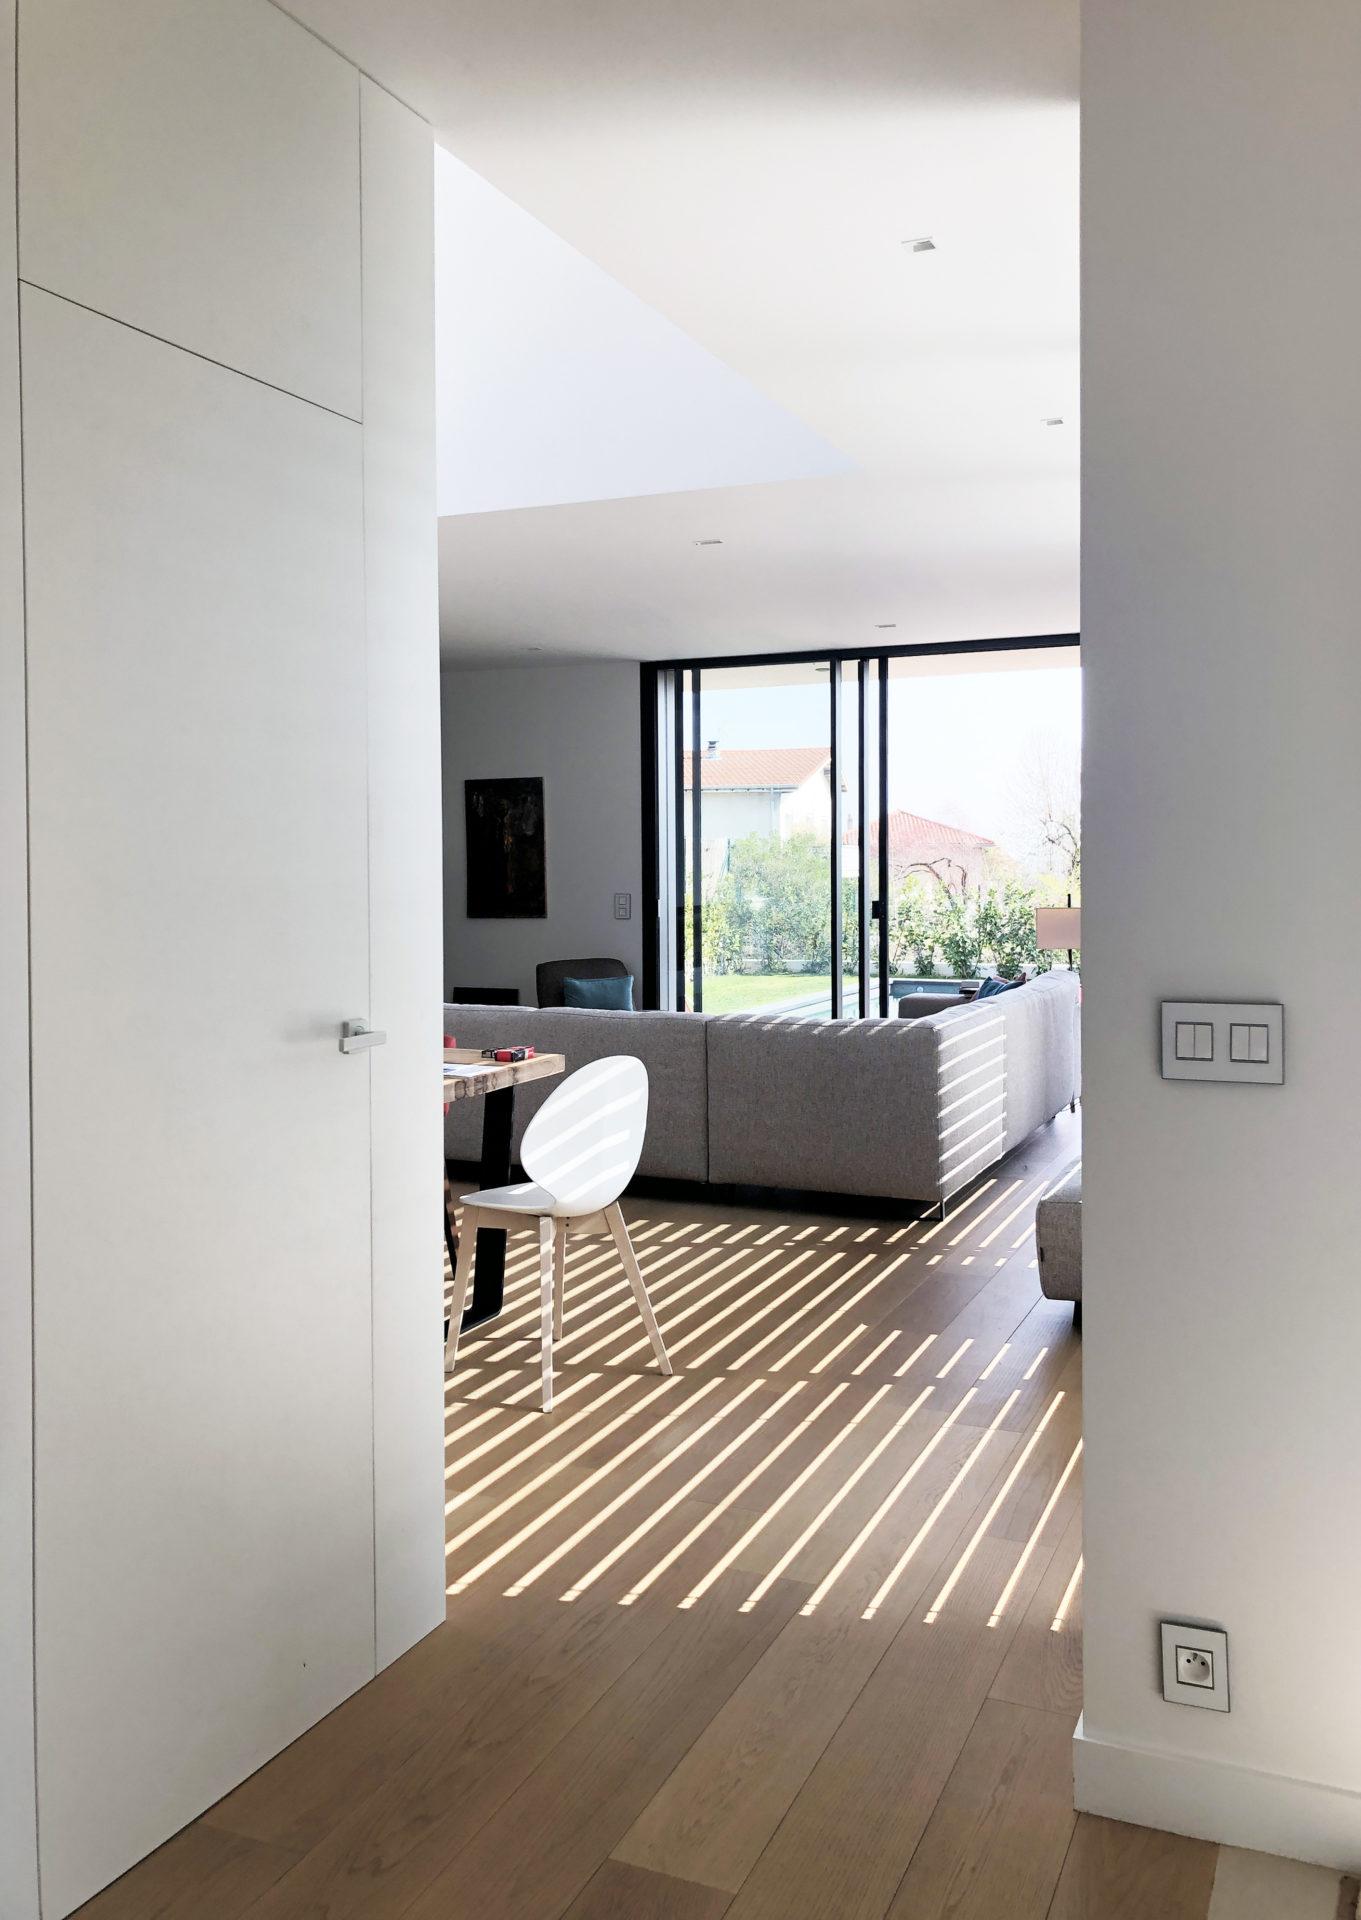 asb-architecture-maison-contemporaine-toiture-terrasse-stores BSO